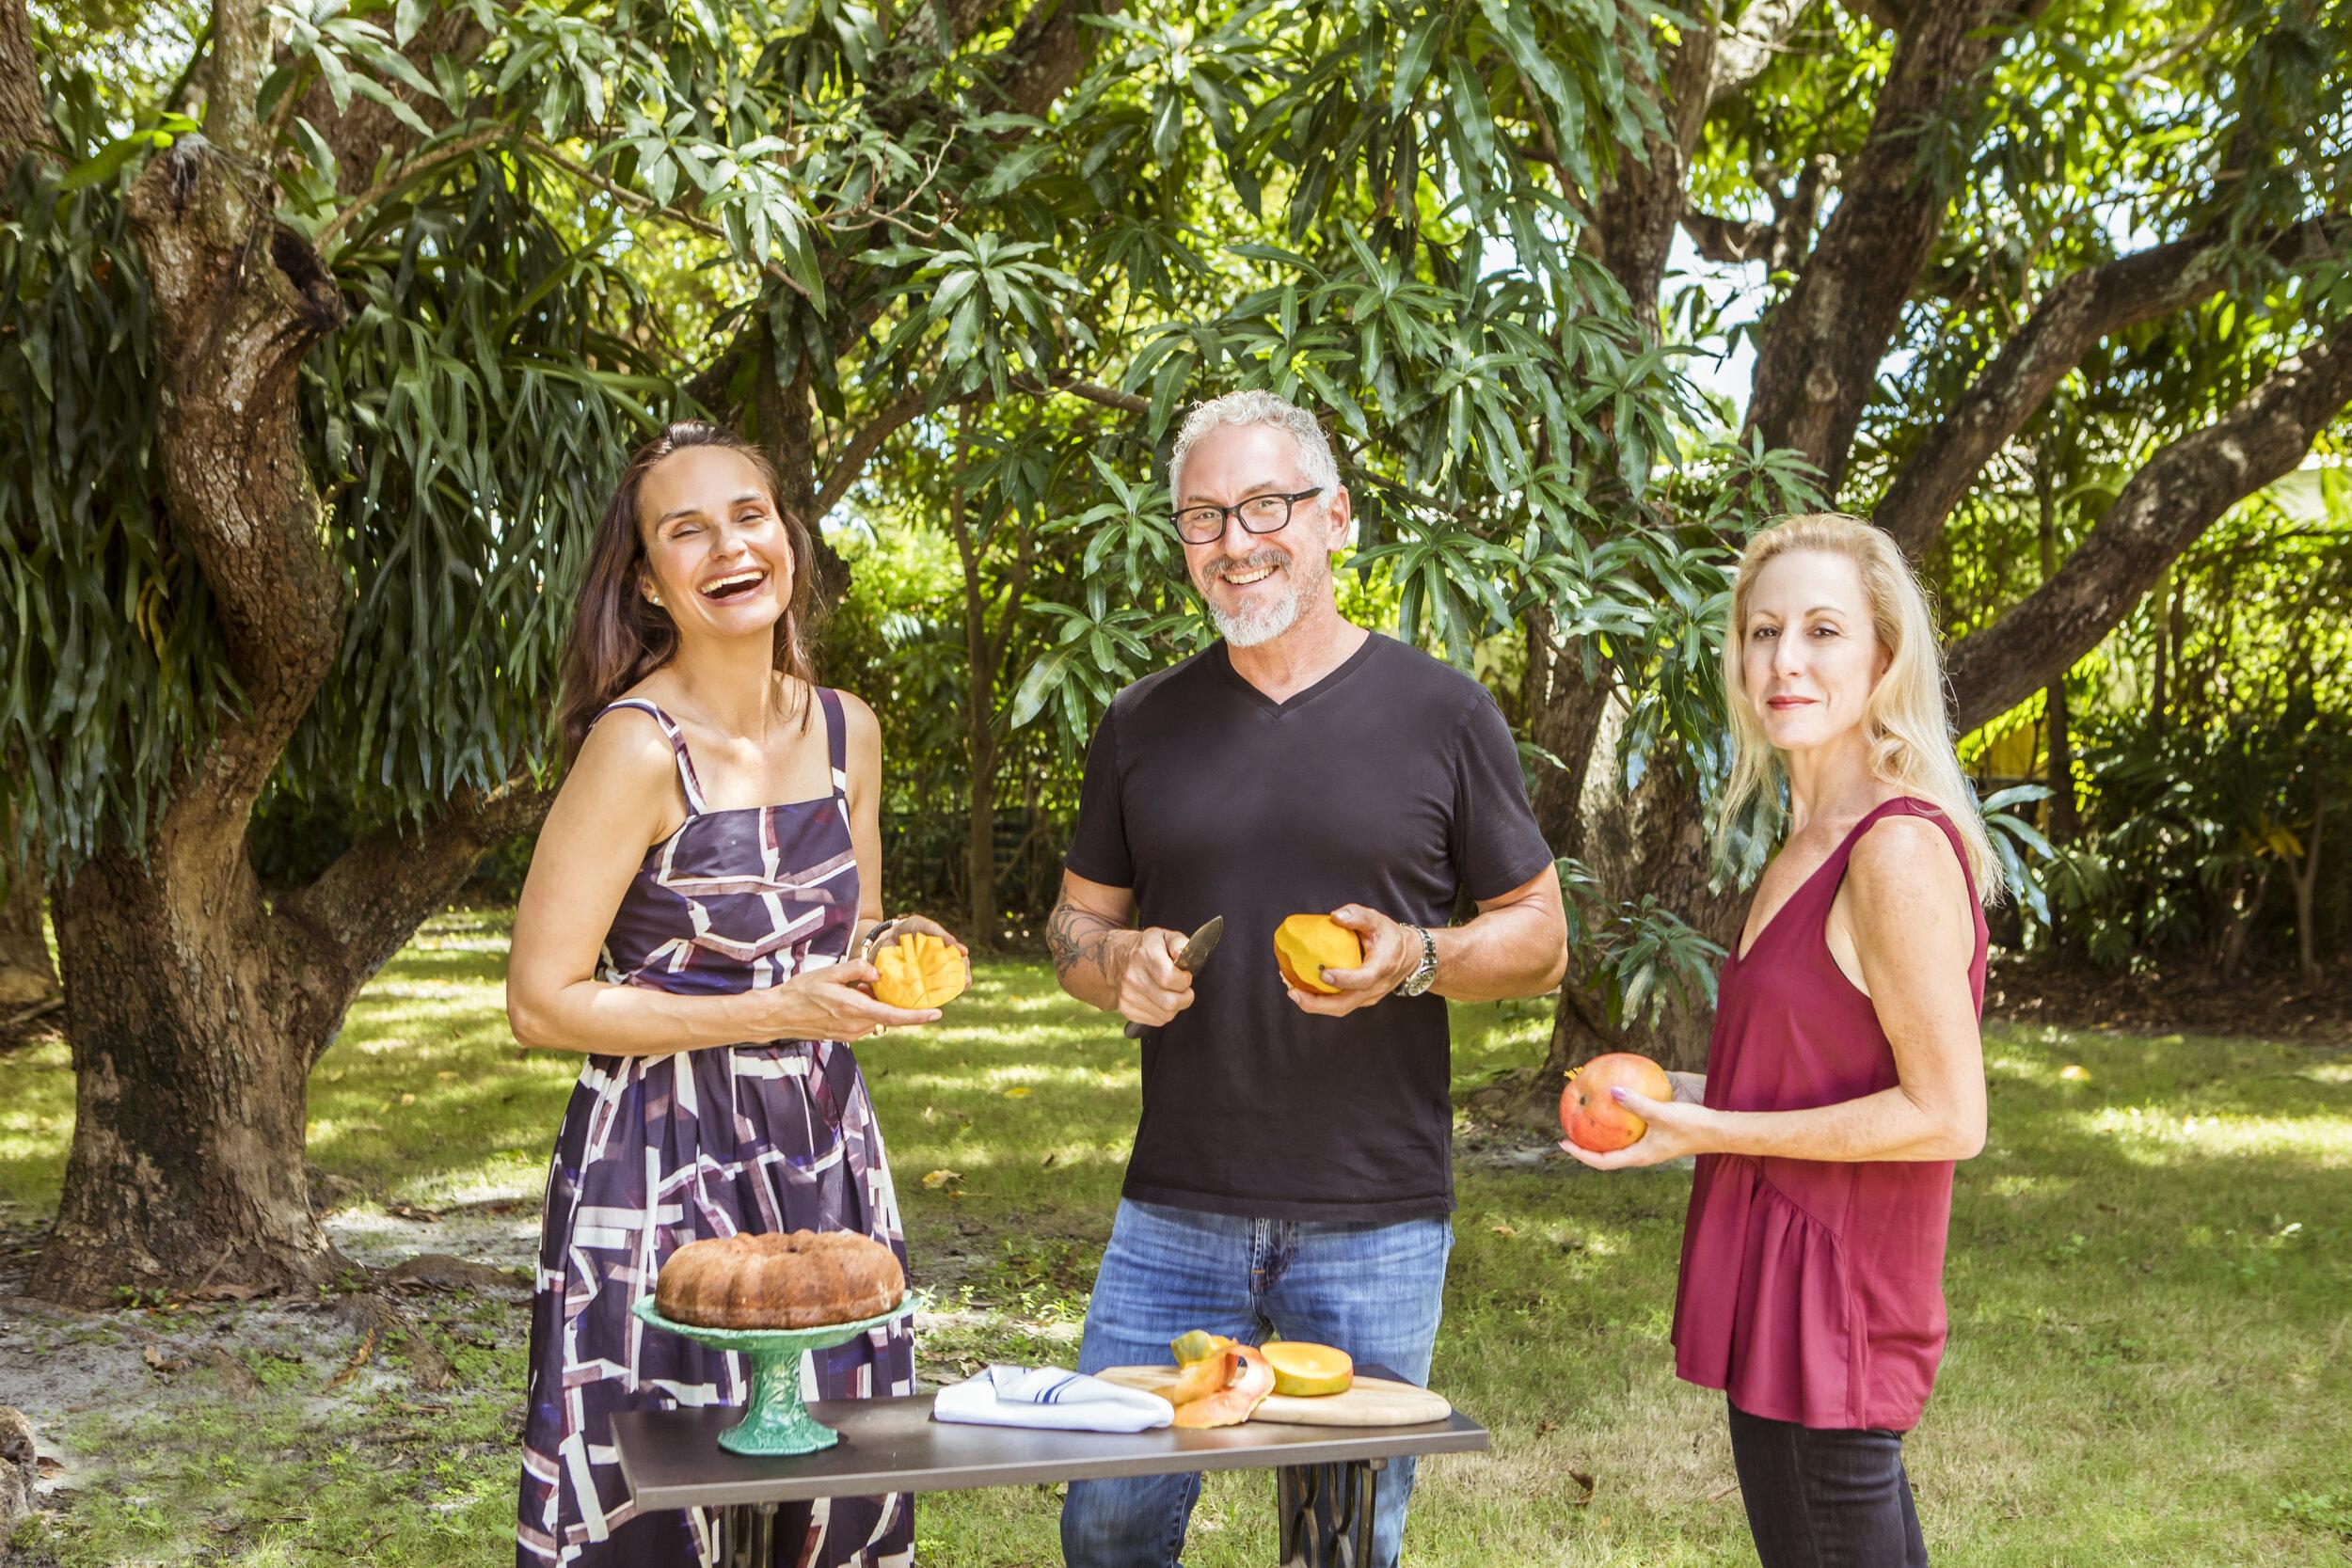 Geane Brito (Compass Agent), Chef Michael Schwartz, and Jen Karetnick (Homeowner)